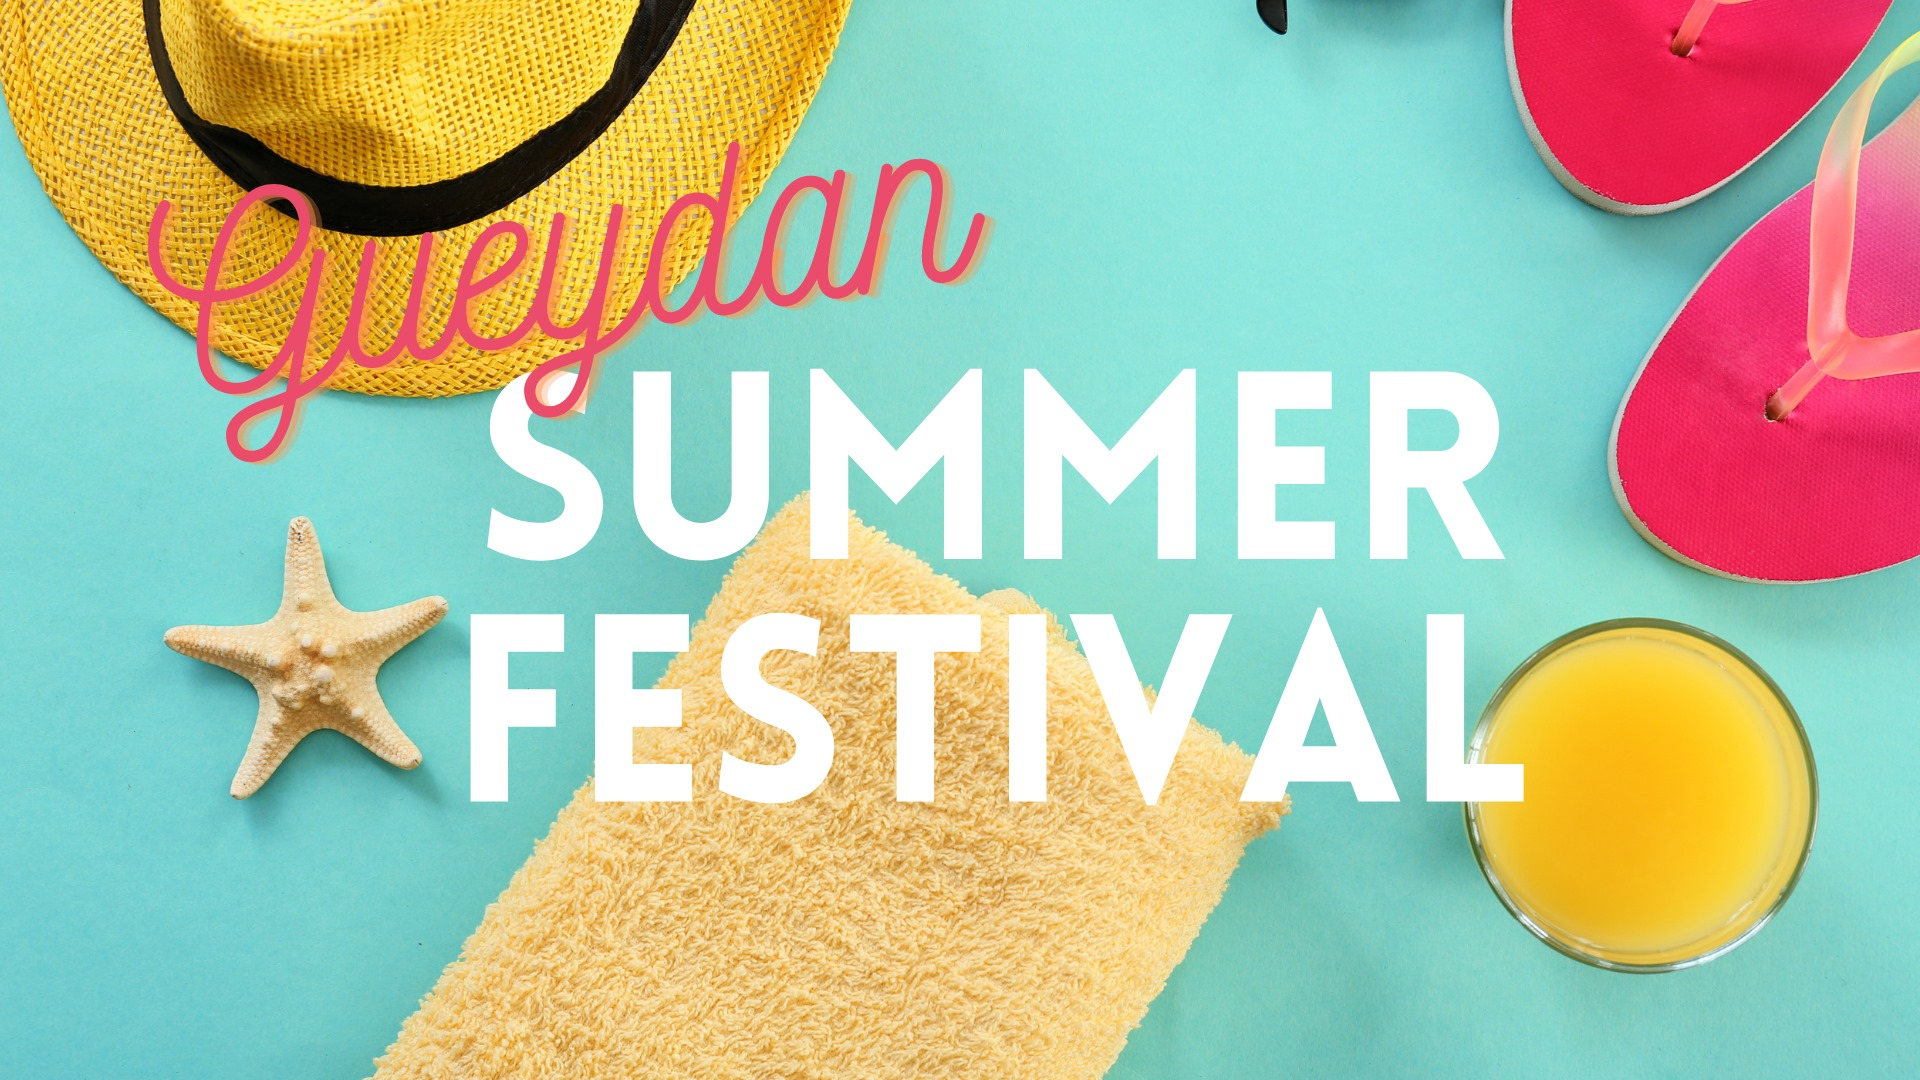 LDH to host Gueydan summer festival